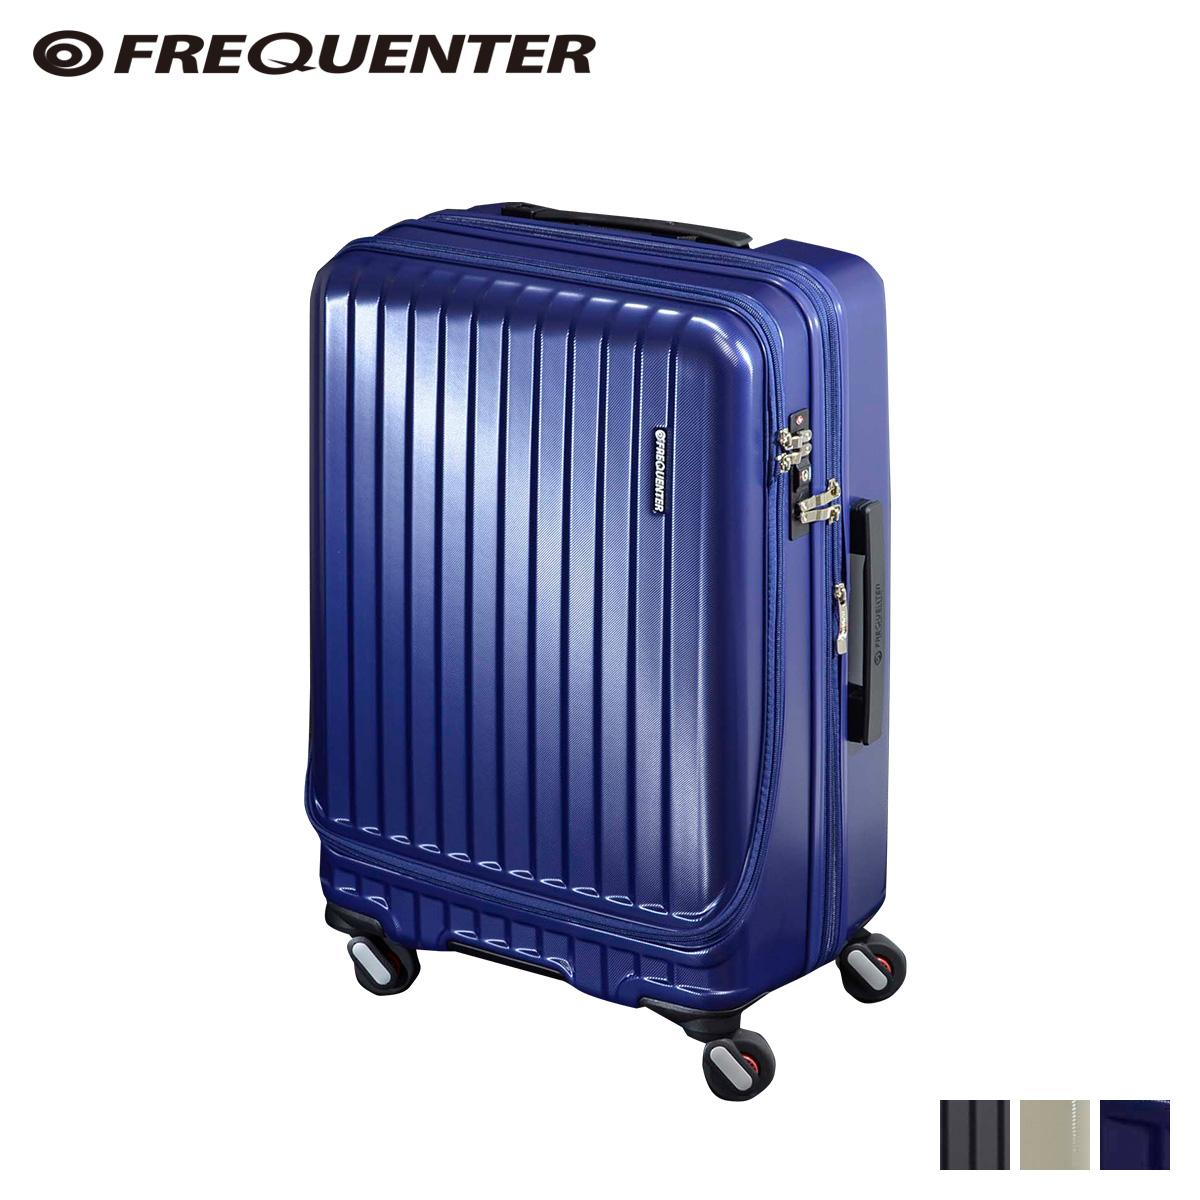 FREQUENTER MALIE フリクエンター スーツケース キャリーケース キャリーバッグ マリエ 55-66L メンズ 拡張 ハード ガンメタル アイボリー ネイビー 1-281 [10/18 新入荷]